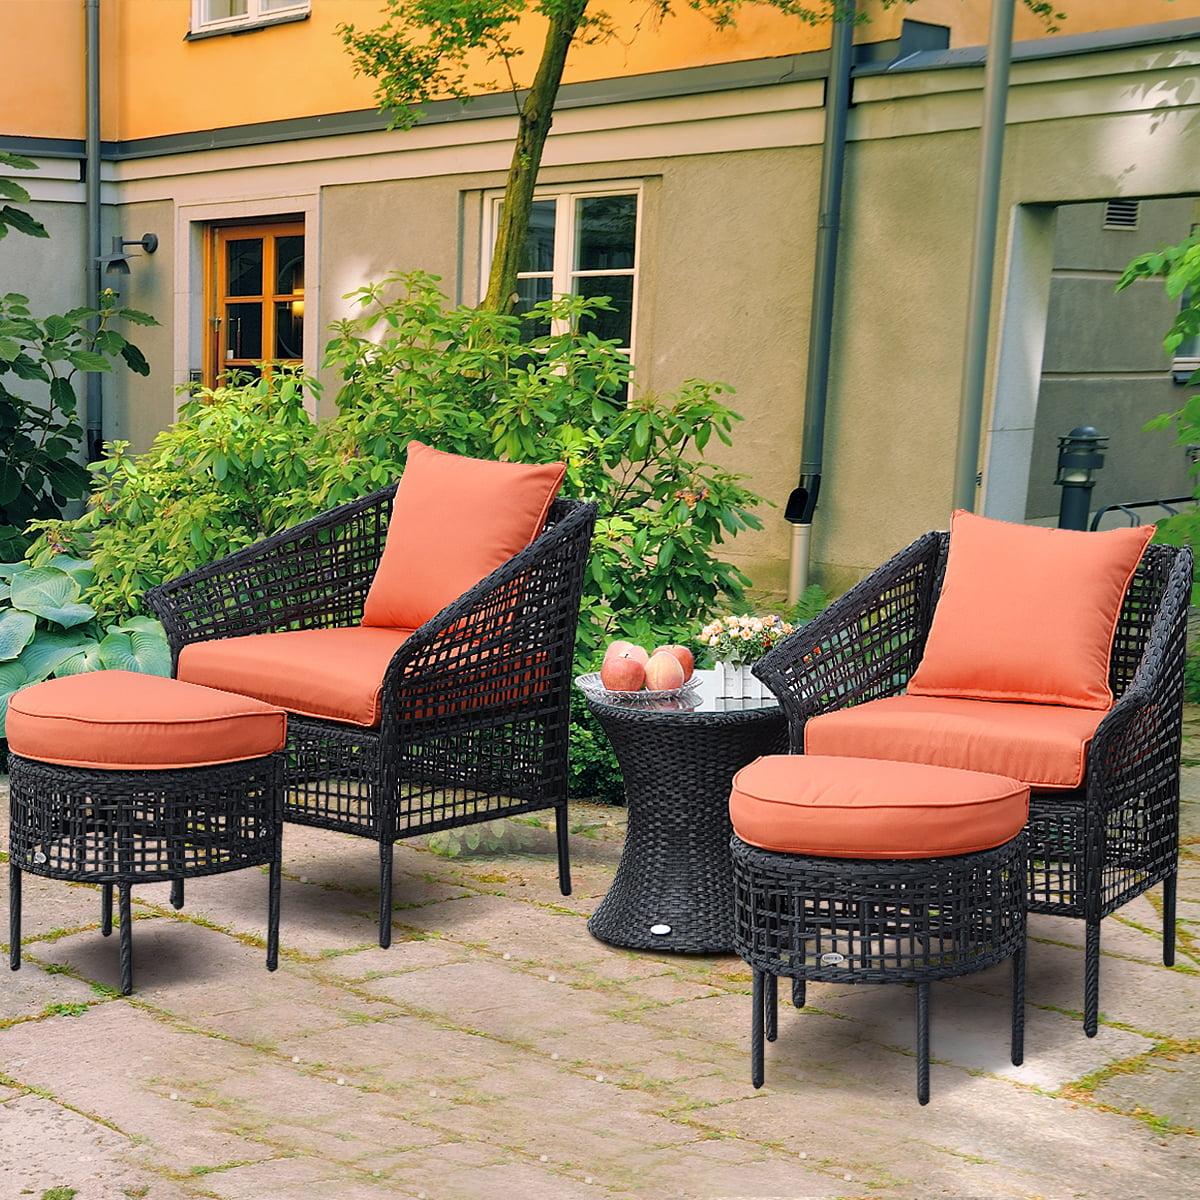 Gymax 5 PCS Patio Rattan Furniture Set Seats Chair Table With Ottoman Orange